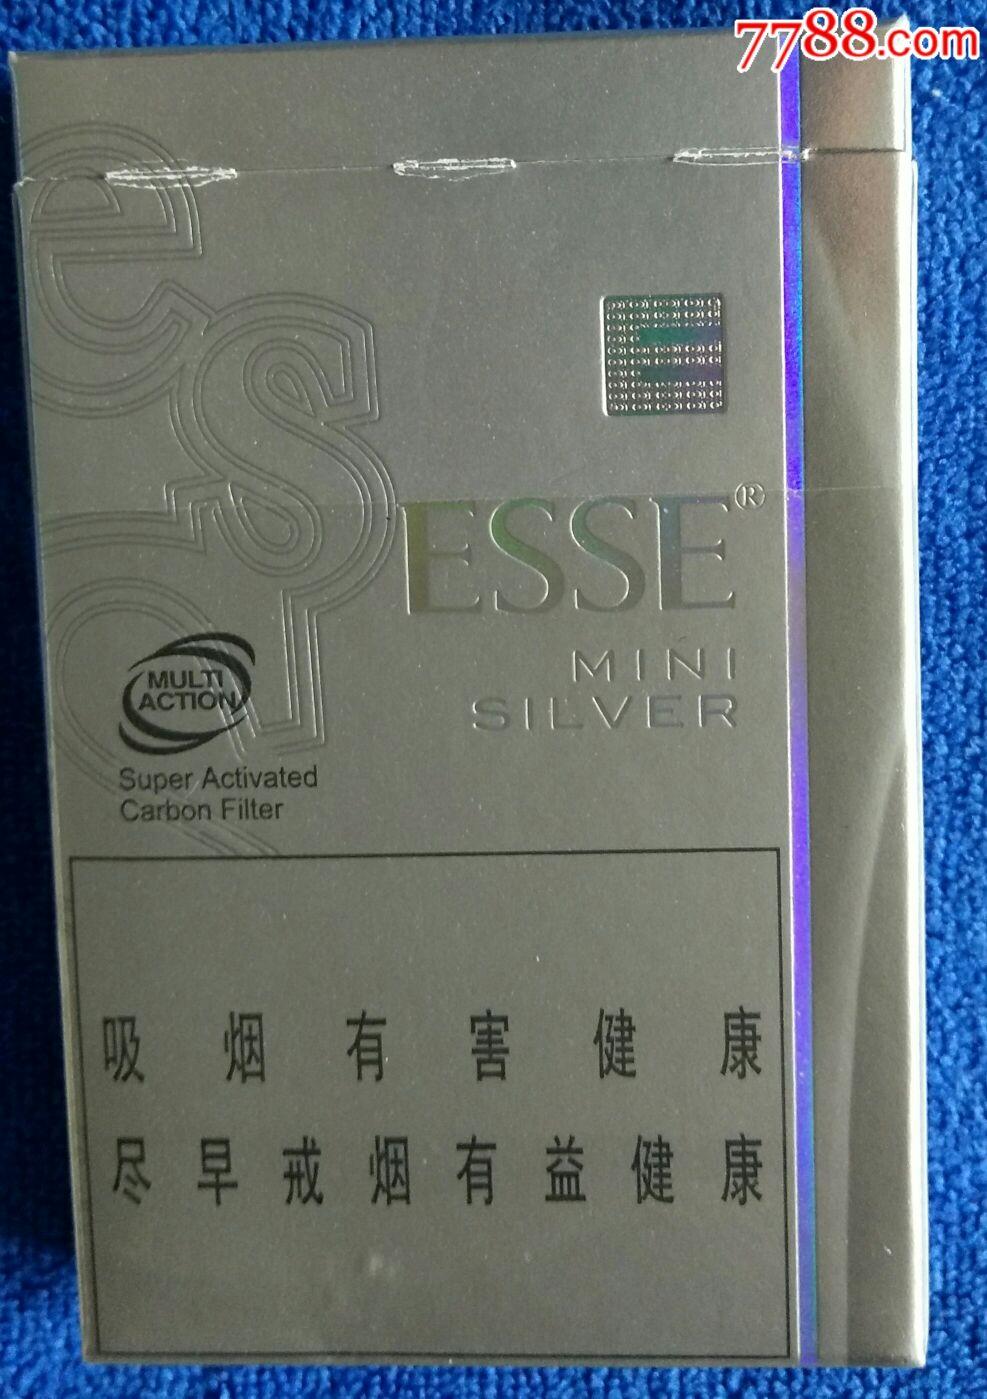 esse香烟_esse超细香烟